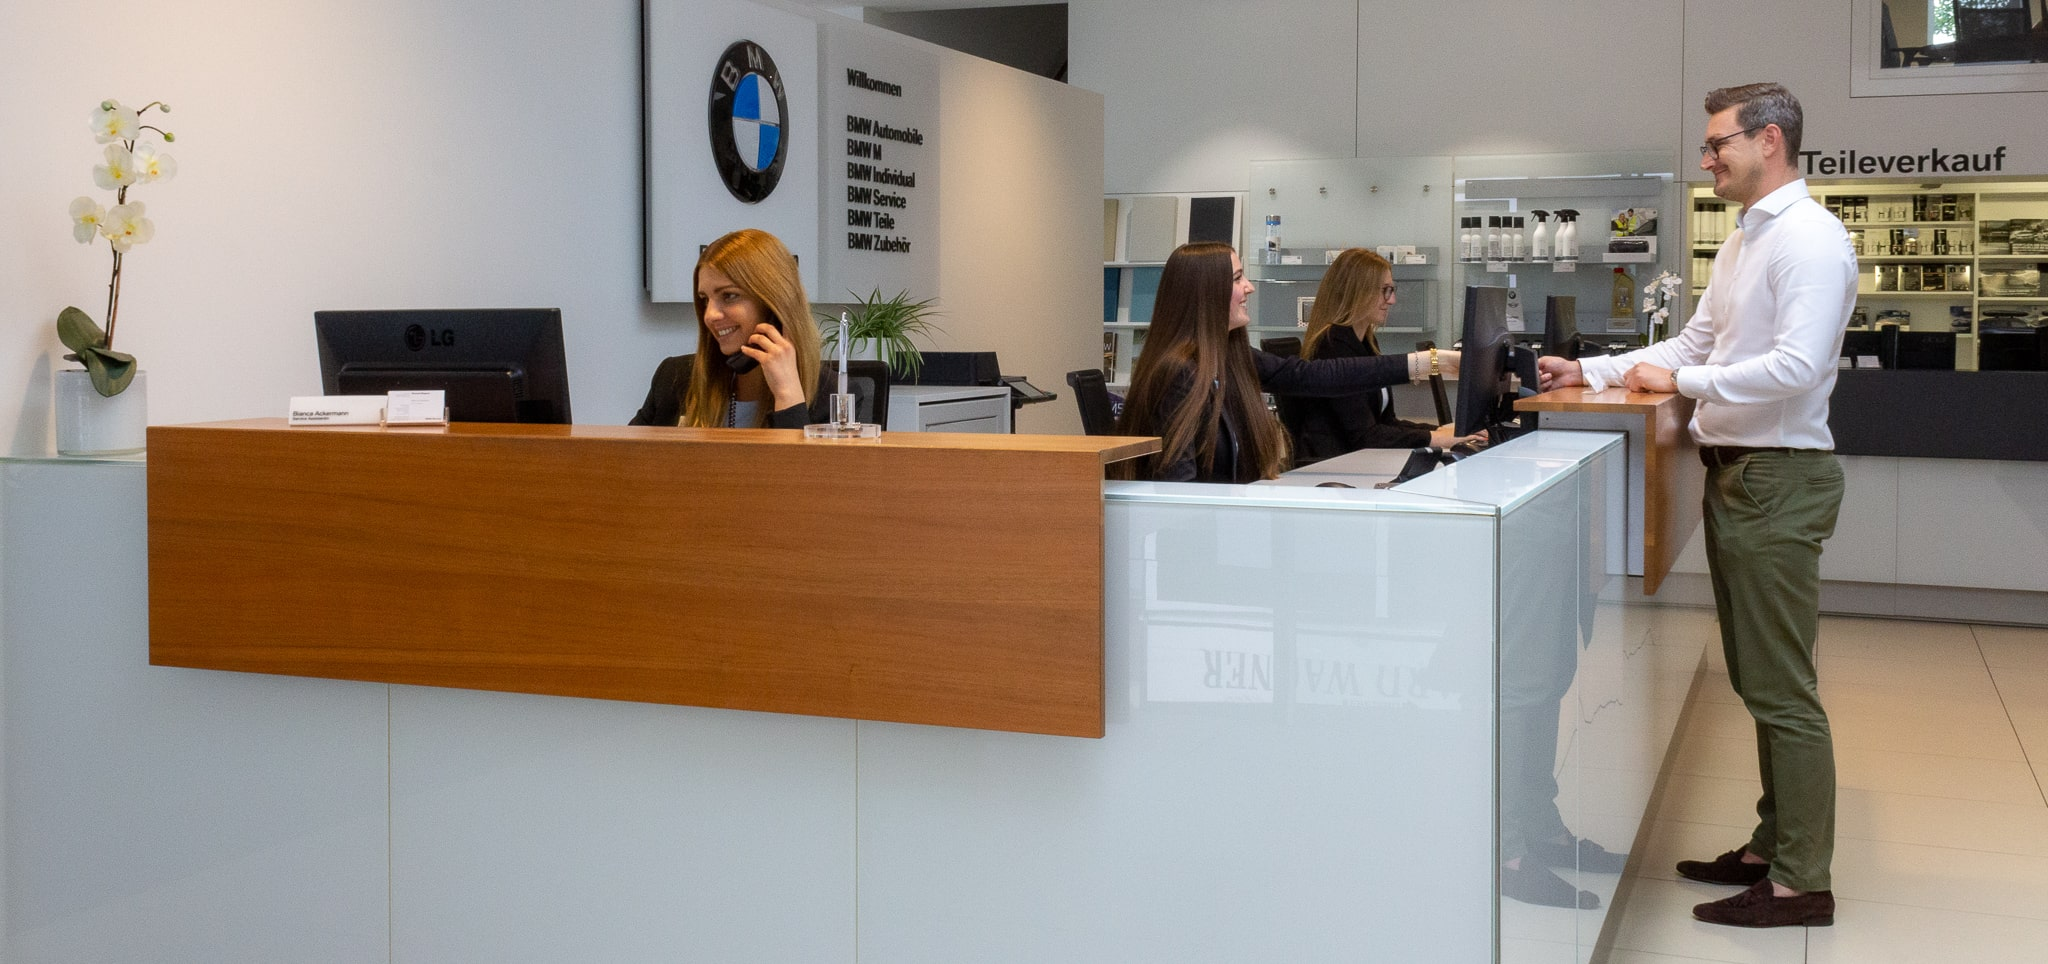 BMW Wagner - Karriere